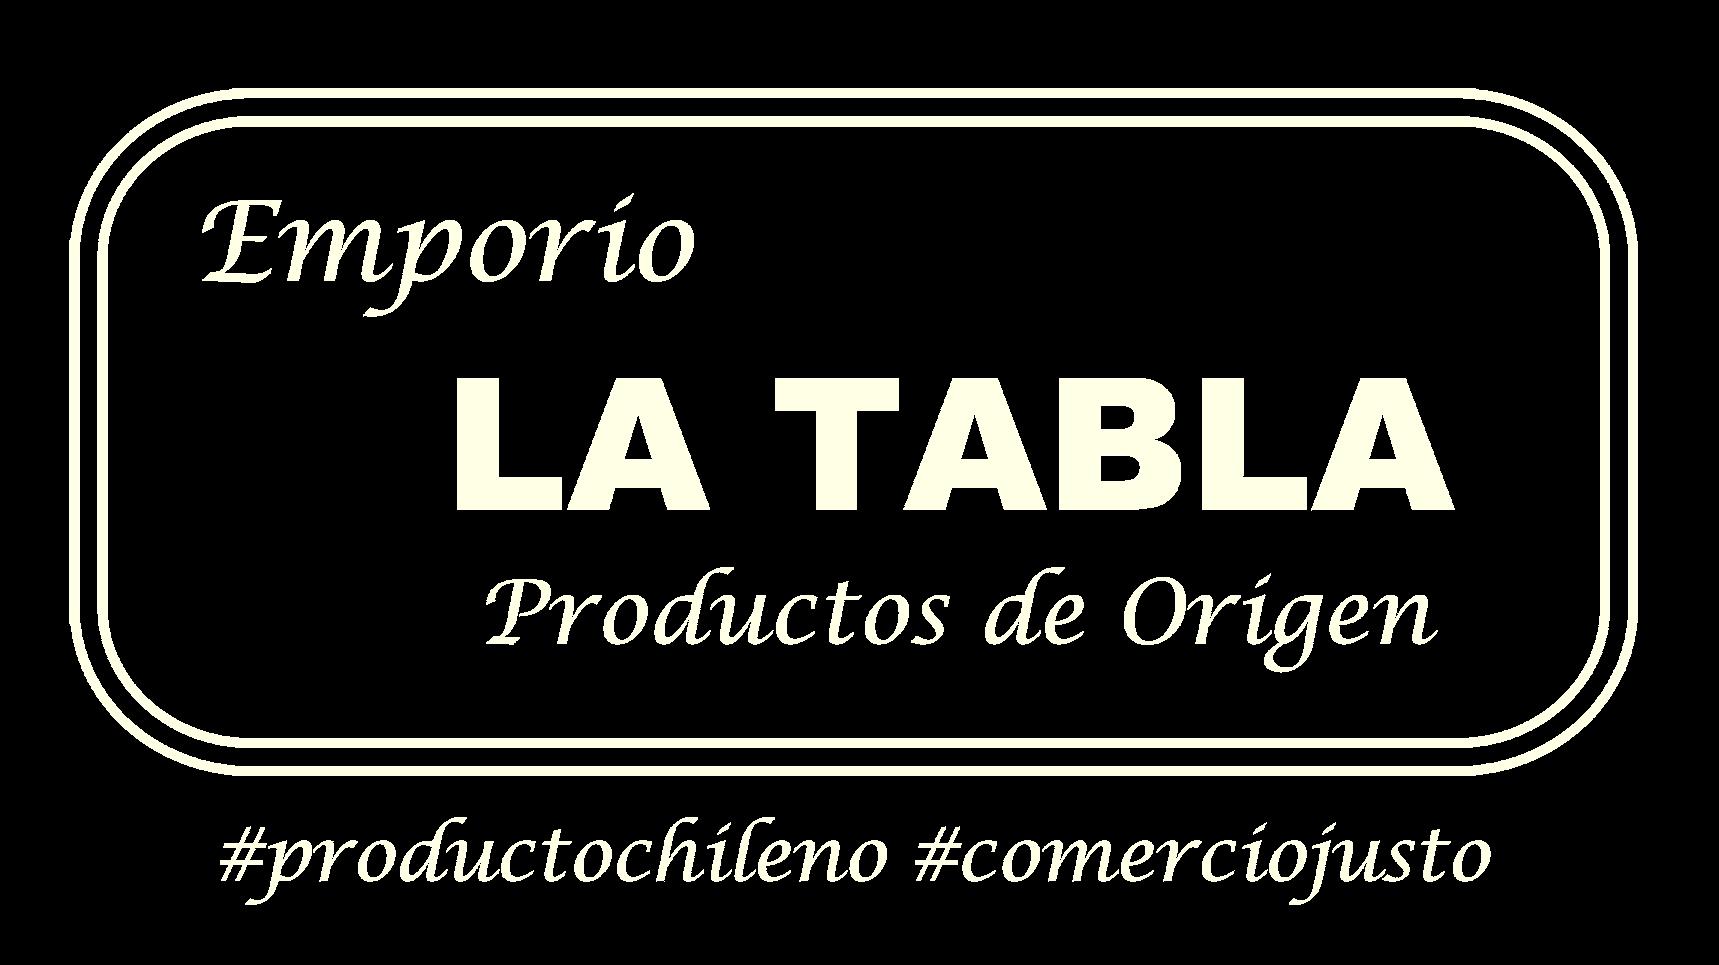 EMPORIO LA TABLA